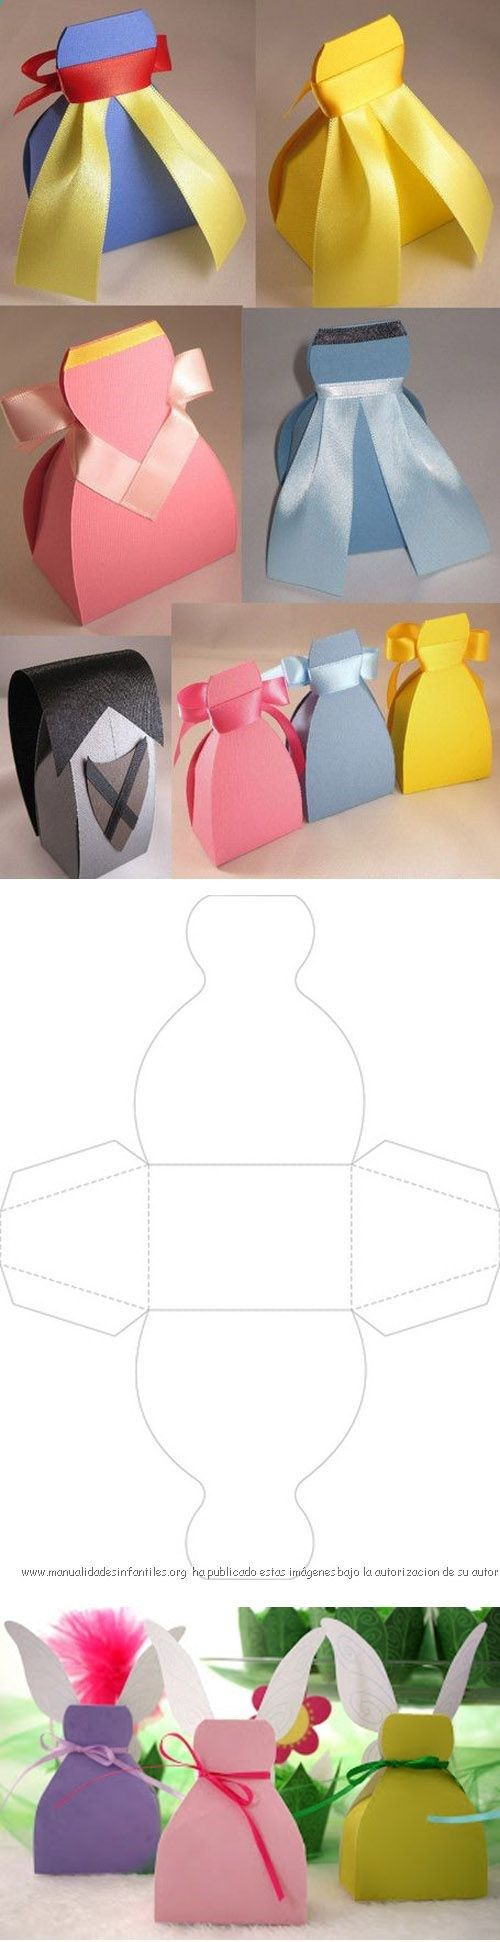 Bolsitos de vestido de mujer